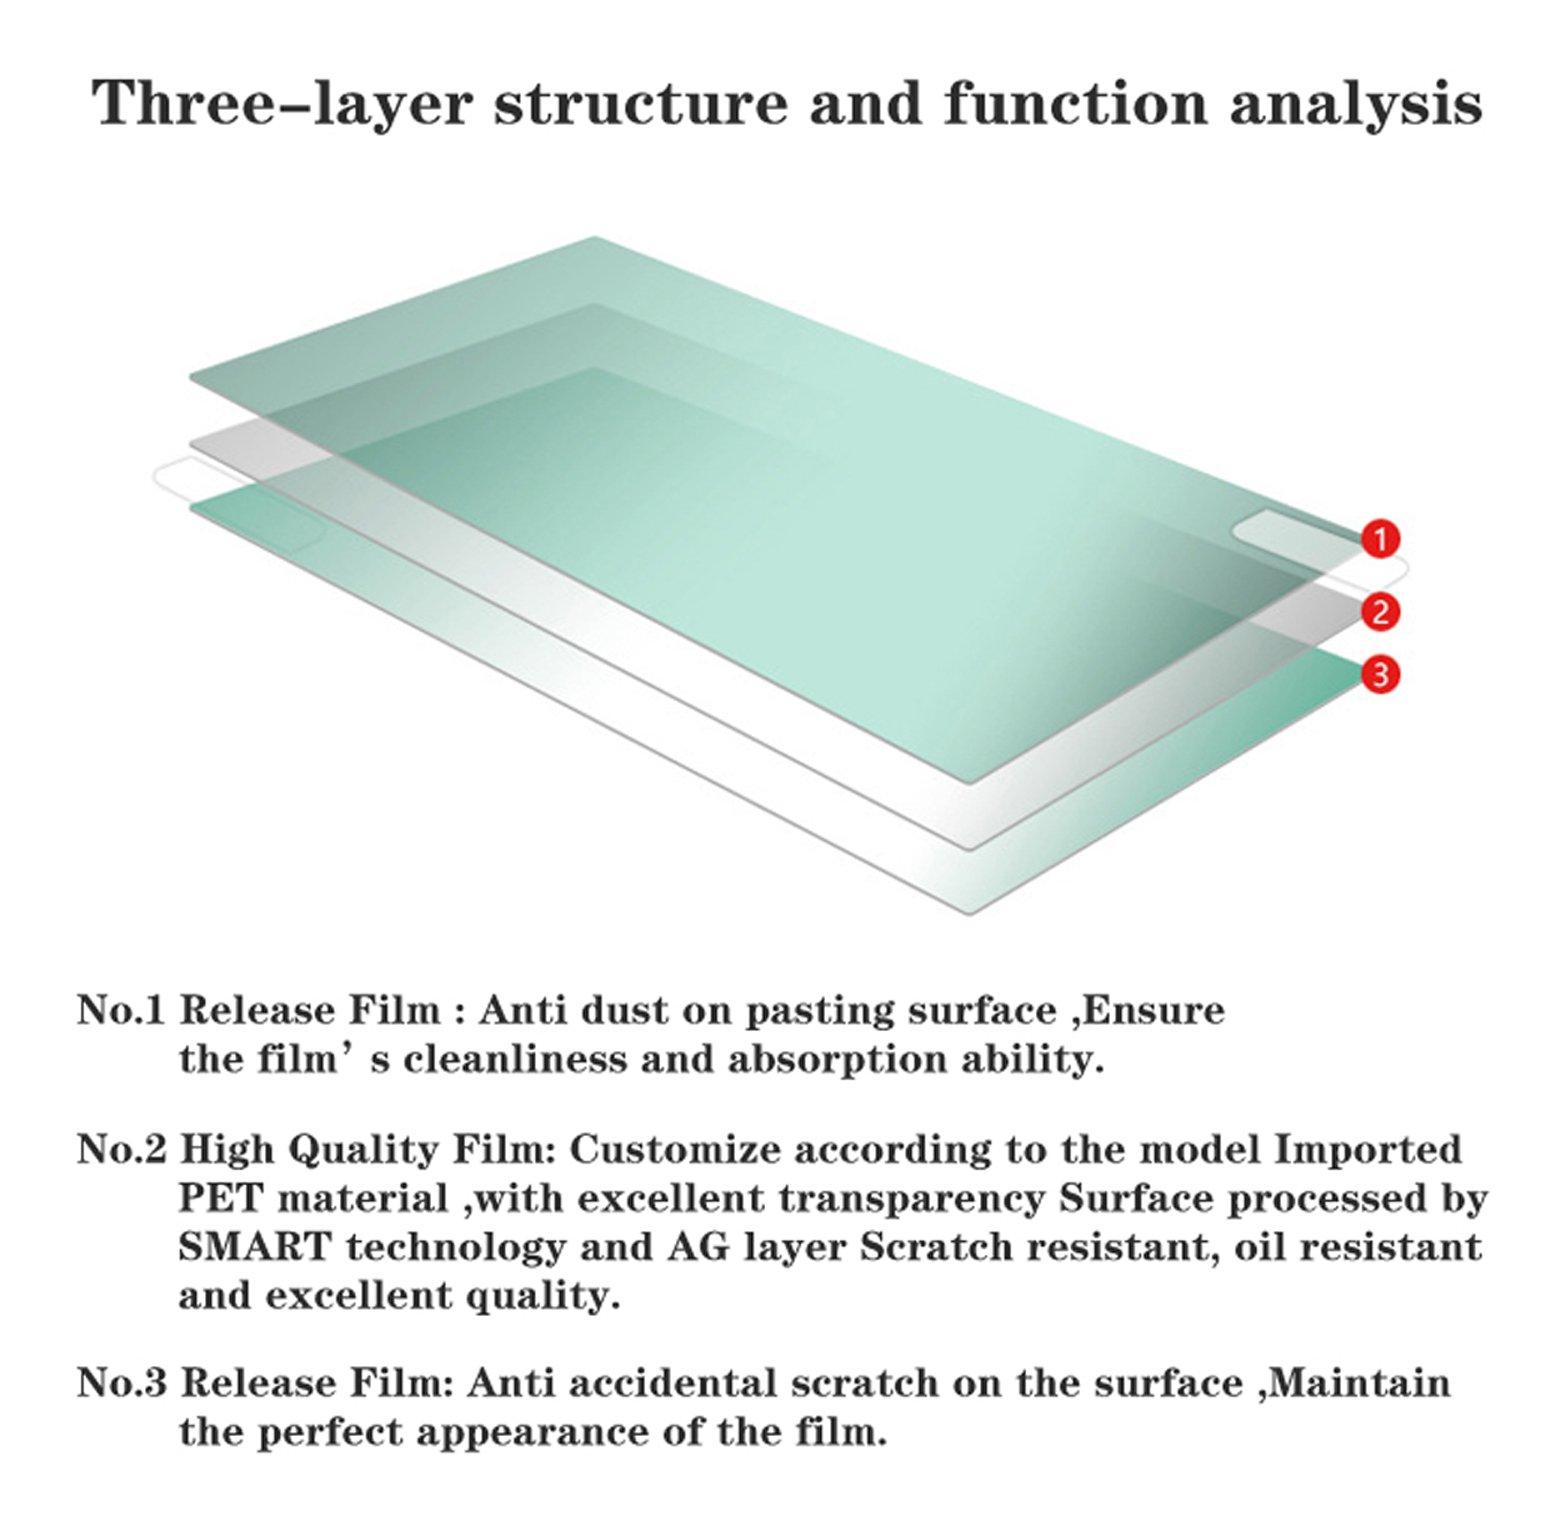 Lenovo 500e Chromebook Screen Protector,HD Clear LCD Anti-Scratch Anti-Fingerprints Guard Film For 11.6'' Lenovo 500e Chromebook 2-in-1 Laptop(2-pack) by Liudashun (Image #3)